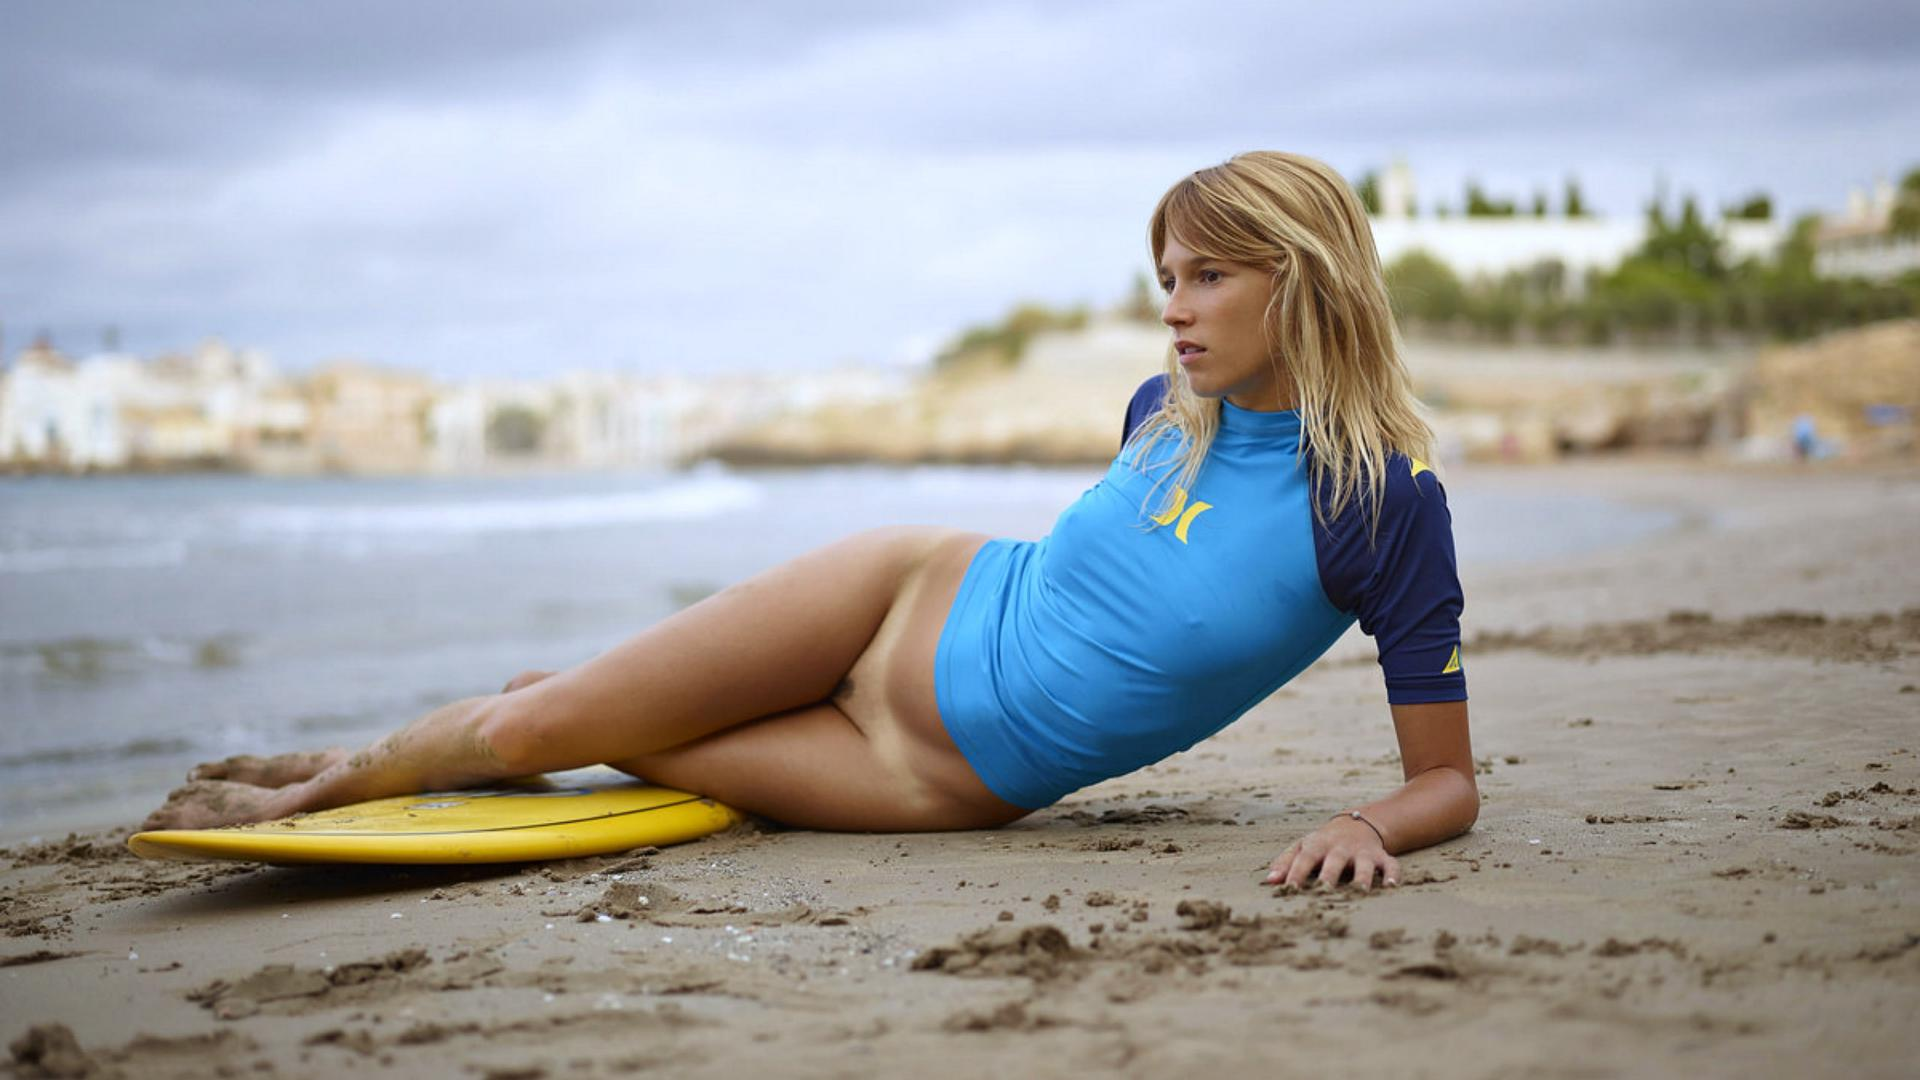 Download photo 1920x1080, patti, model, surfboard, beach